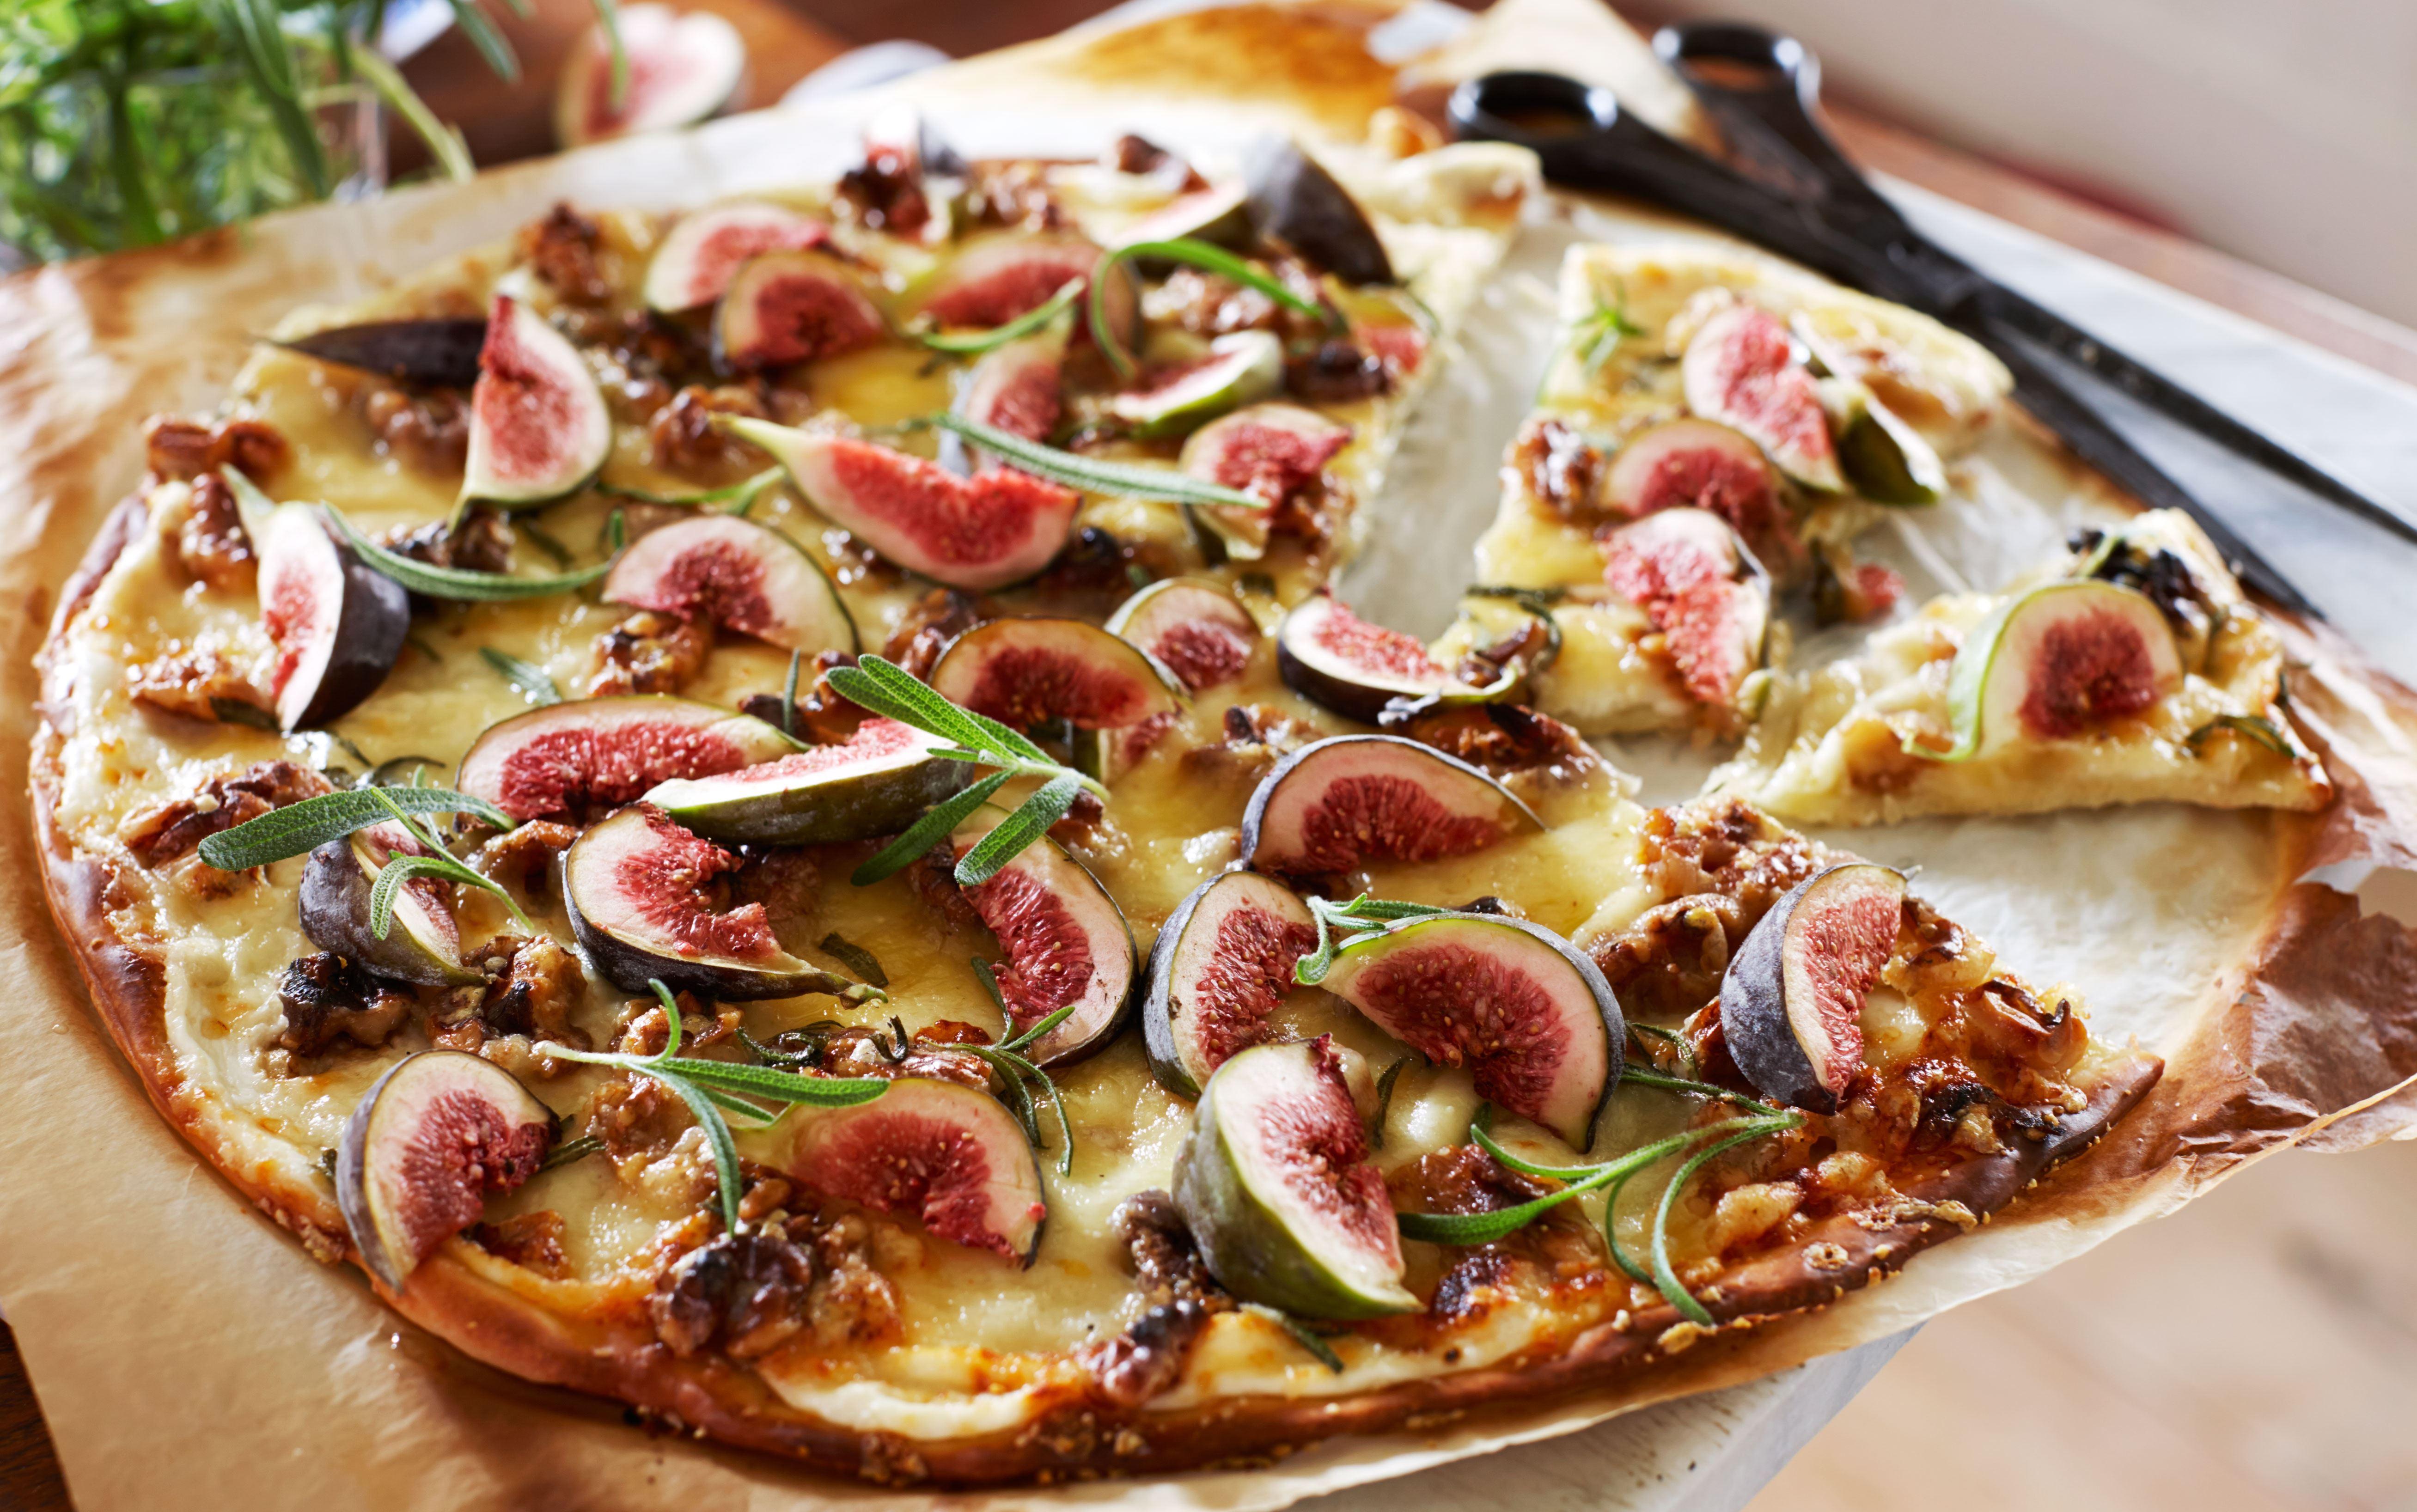 Dessertpizza med friske figner og rosmarin